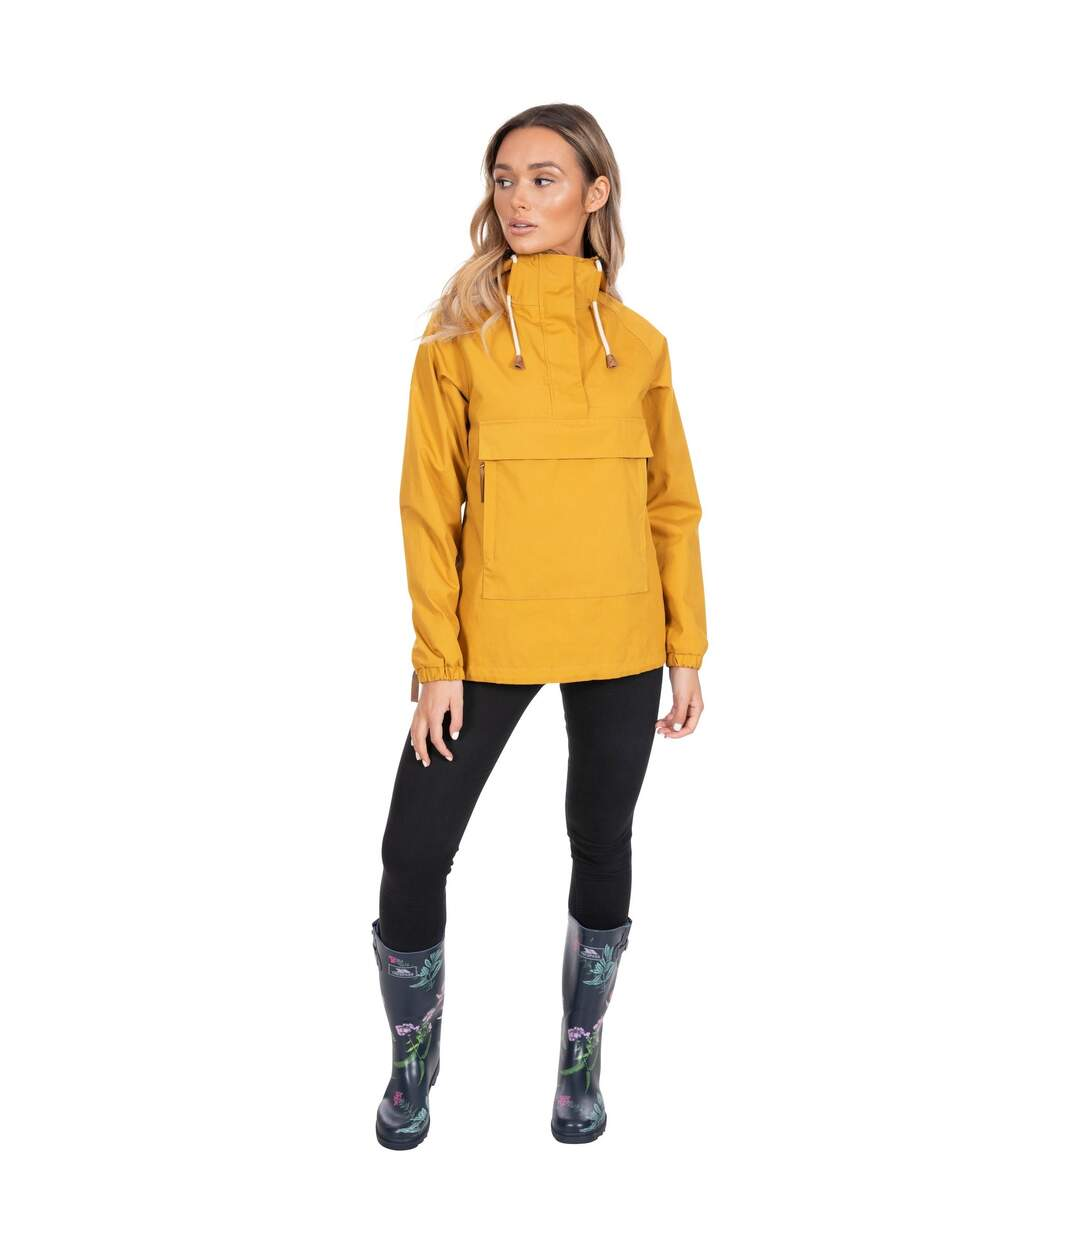 Trespass Womens/Ladies Entirely Waterproof Overhead Jacket (Maize) - UTTP5029